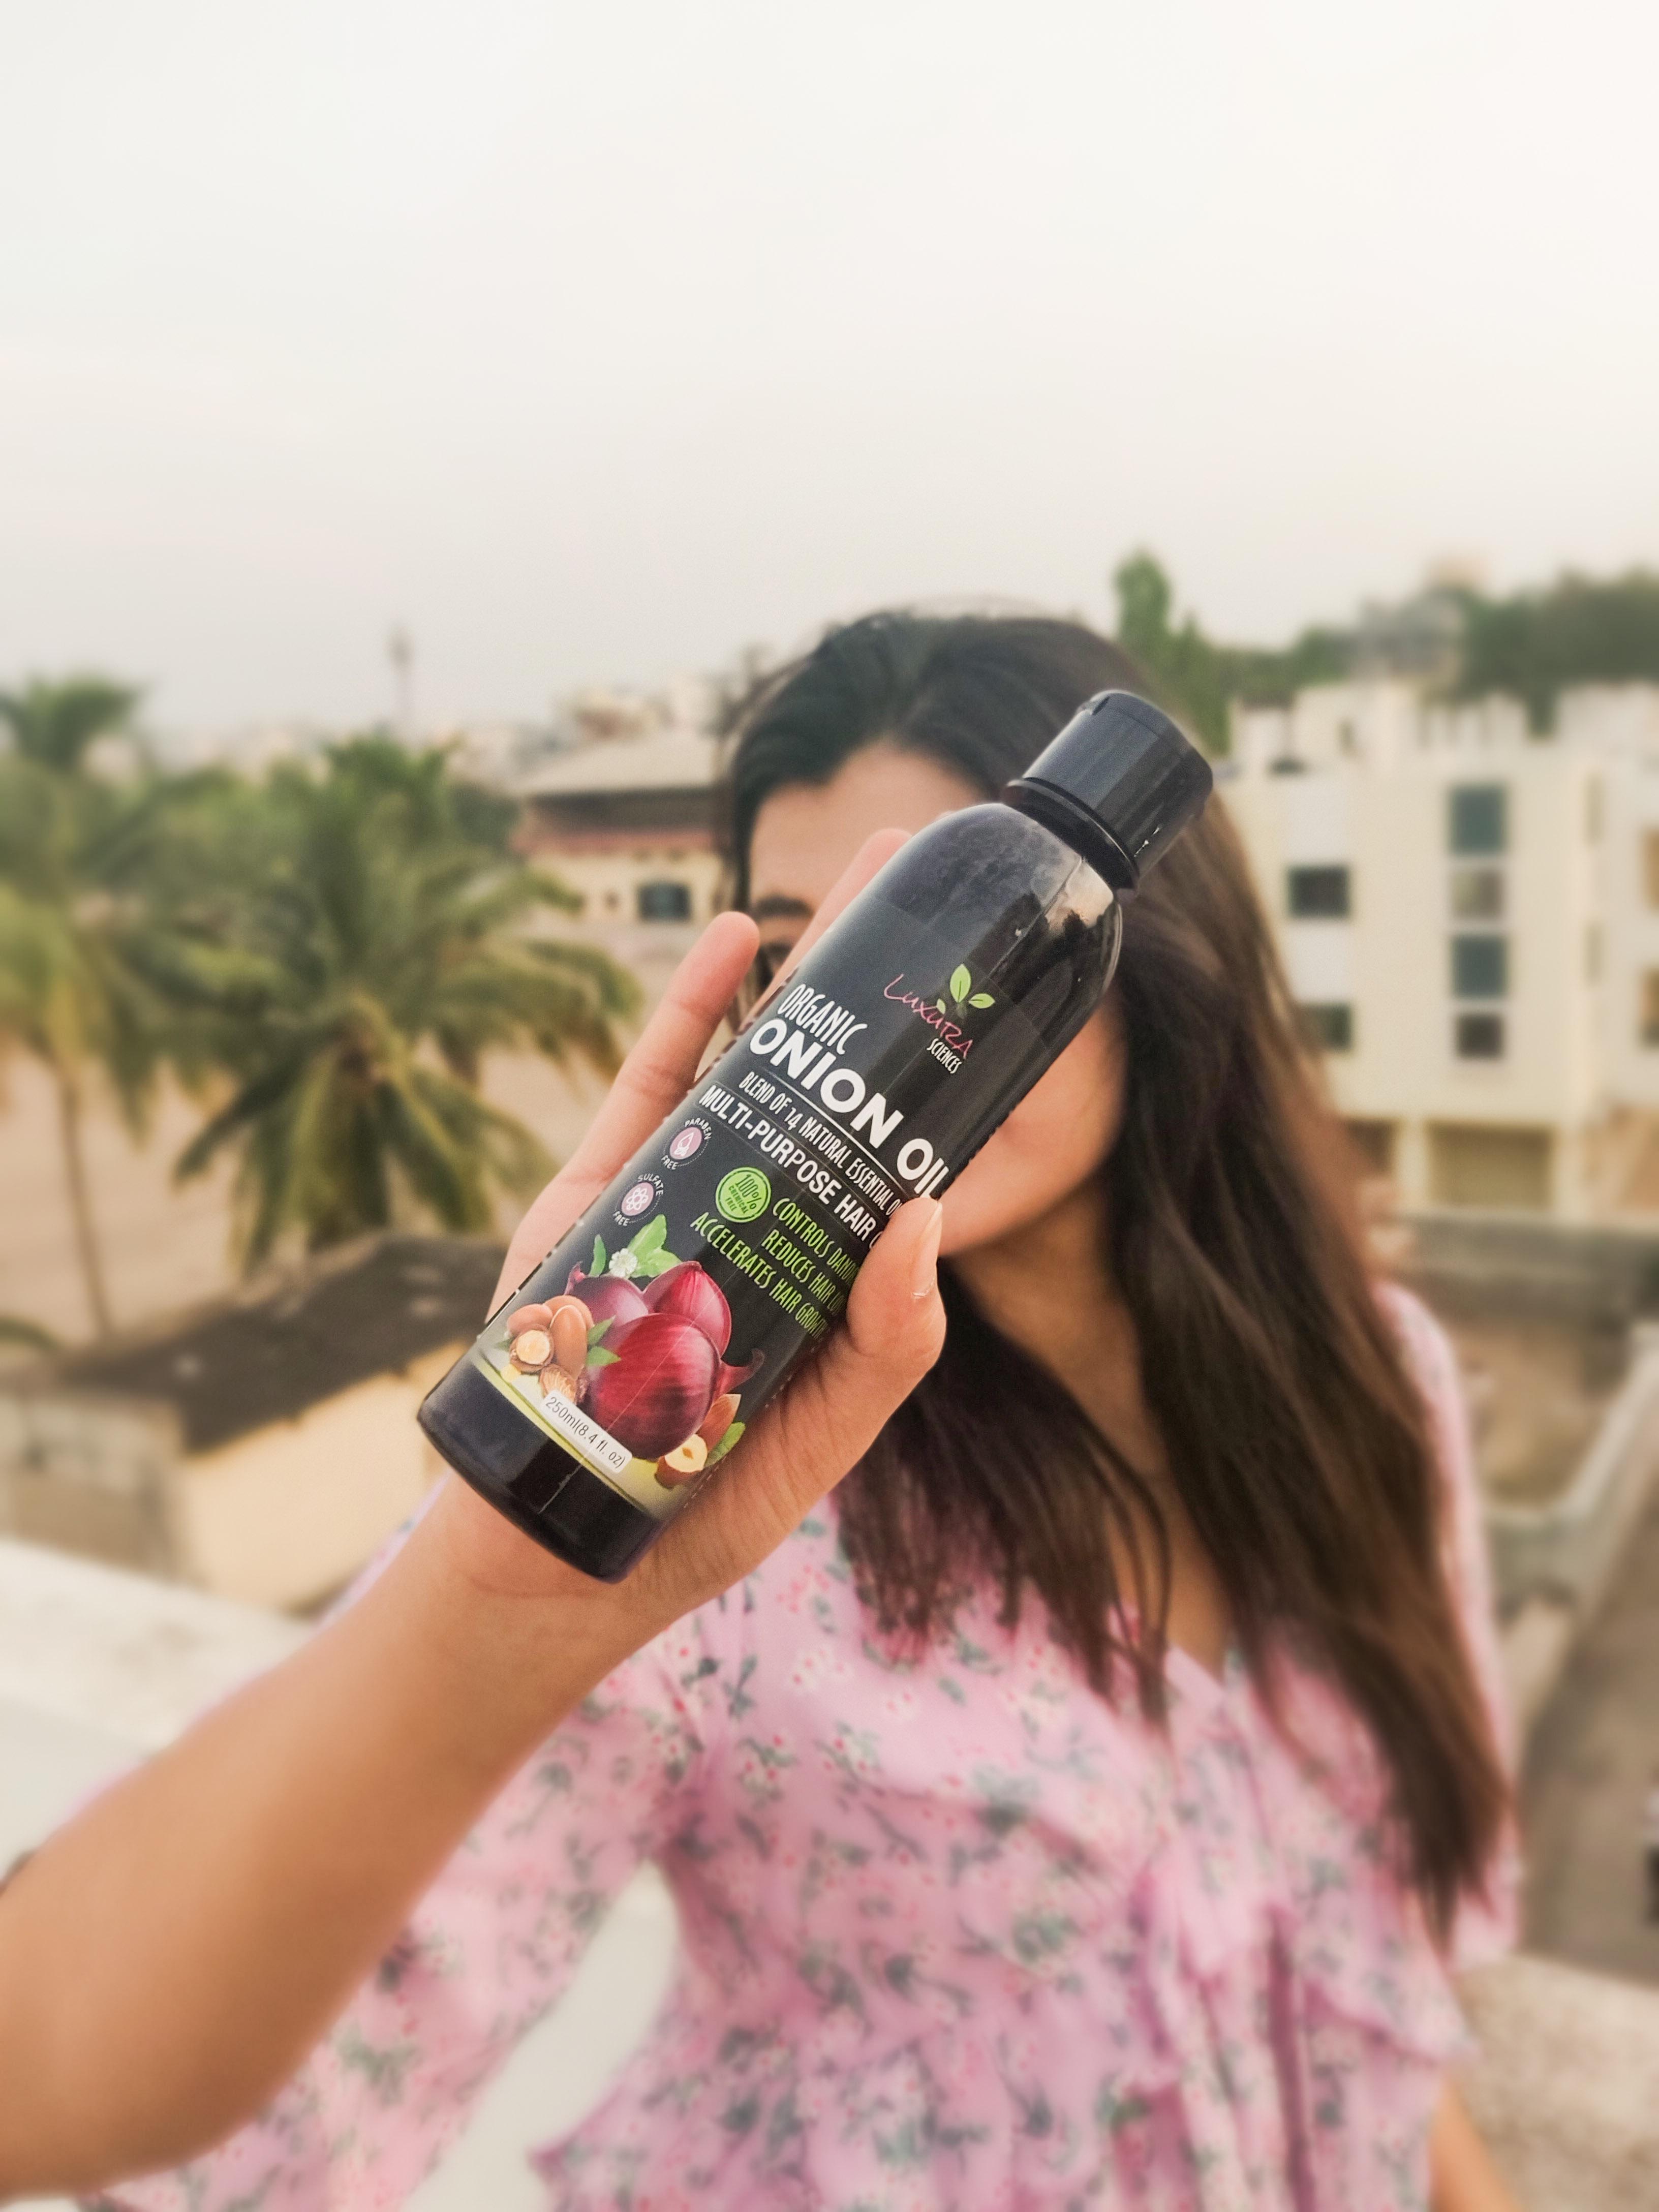 Luxura Sciences Onion Hair Oil 250 ml-Beautifully Blended for Every Hair Type!!-By shrutibhandari3